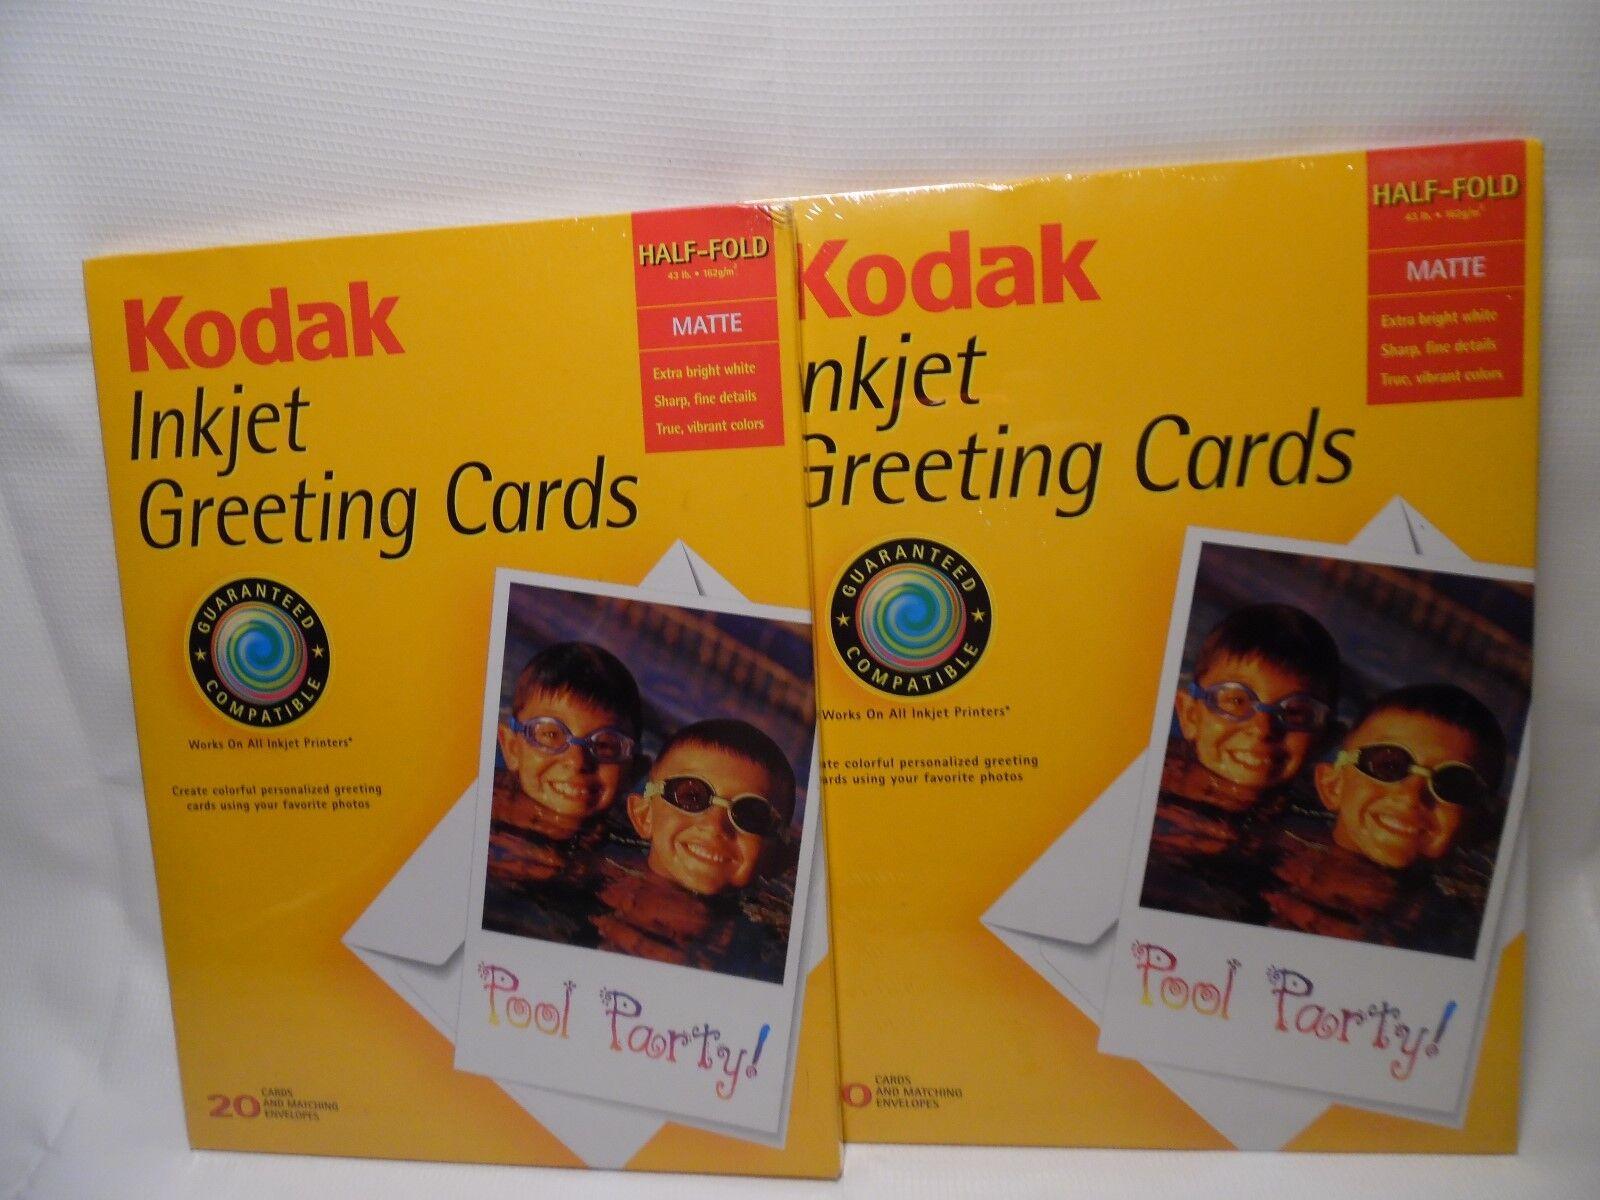 Upc 041771181994 kodak inkjet greeting cards matte 20 per pkg upc 041771181994 product image for kodak inkjet greeting cards matte 20 per pkg kristyandbryce Gallery